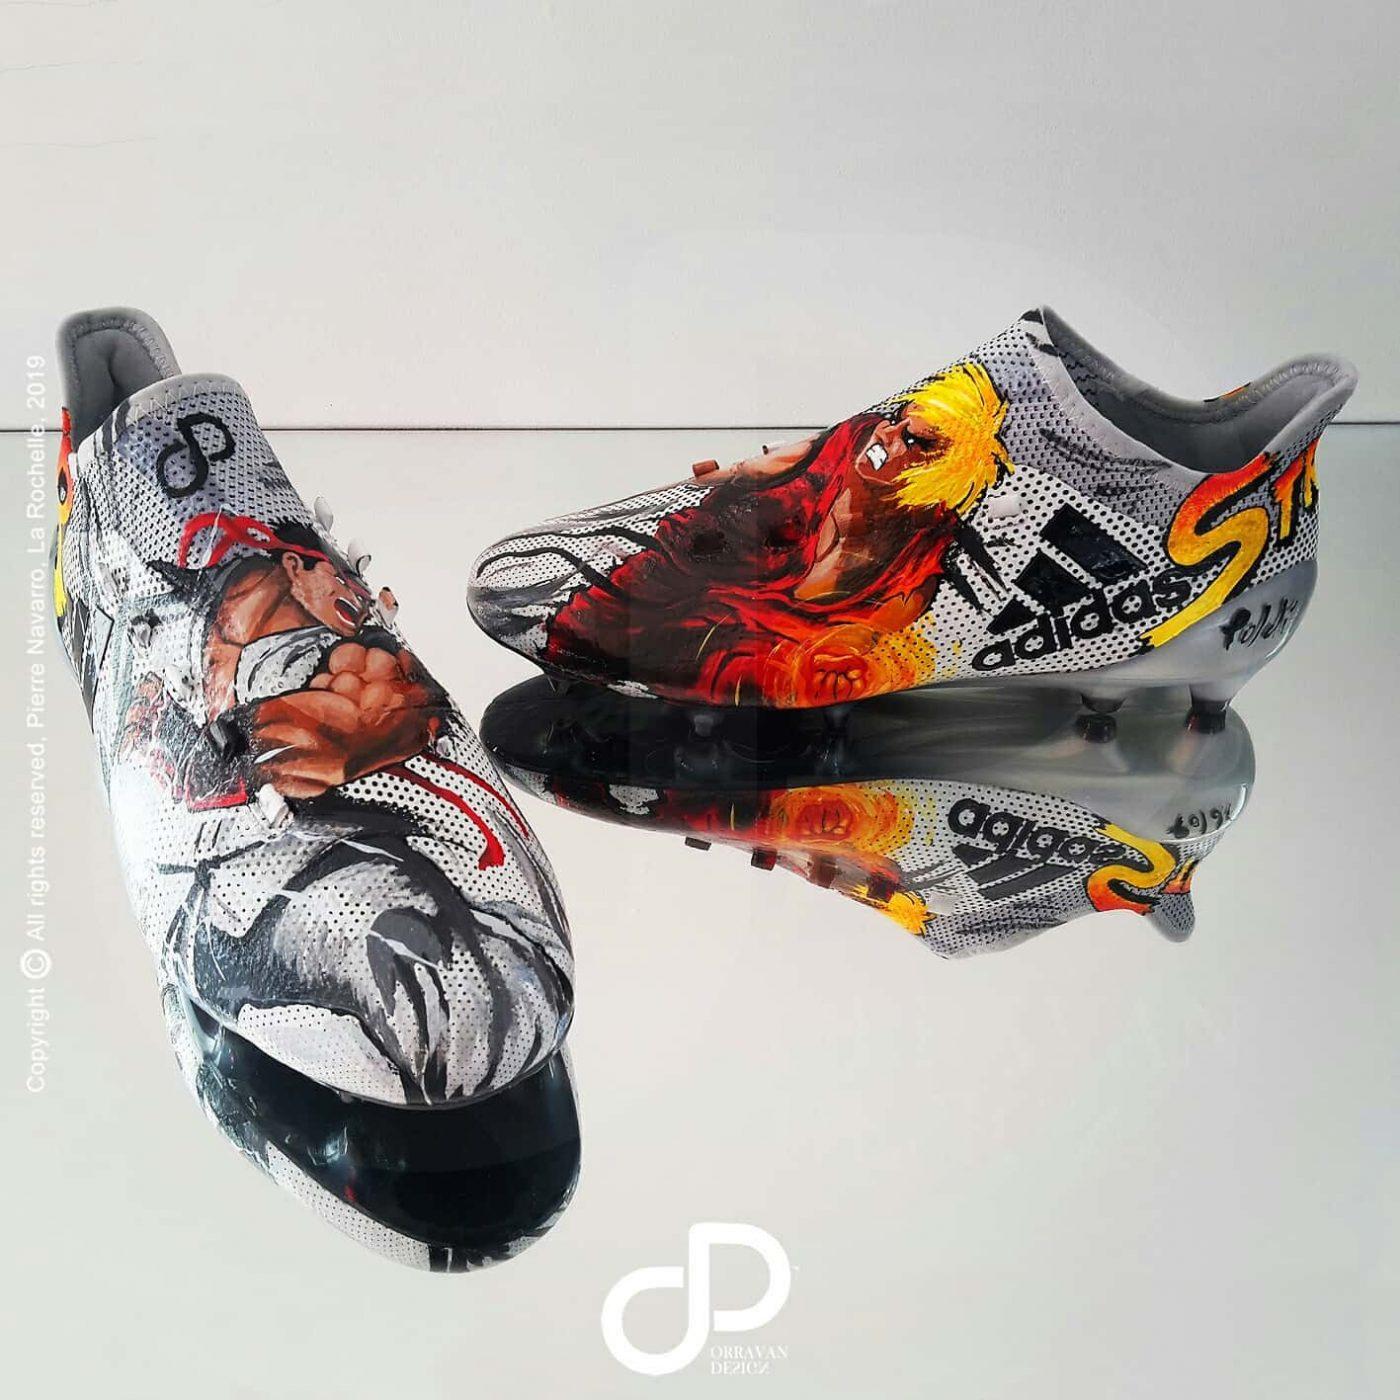 chaussures-lukas-podolski-stree-fighters-orravan-design-2